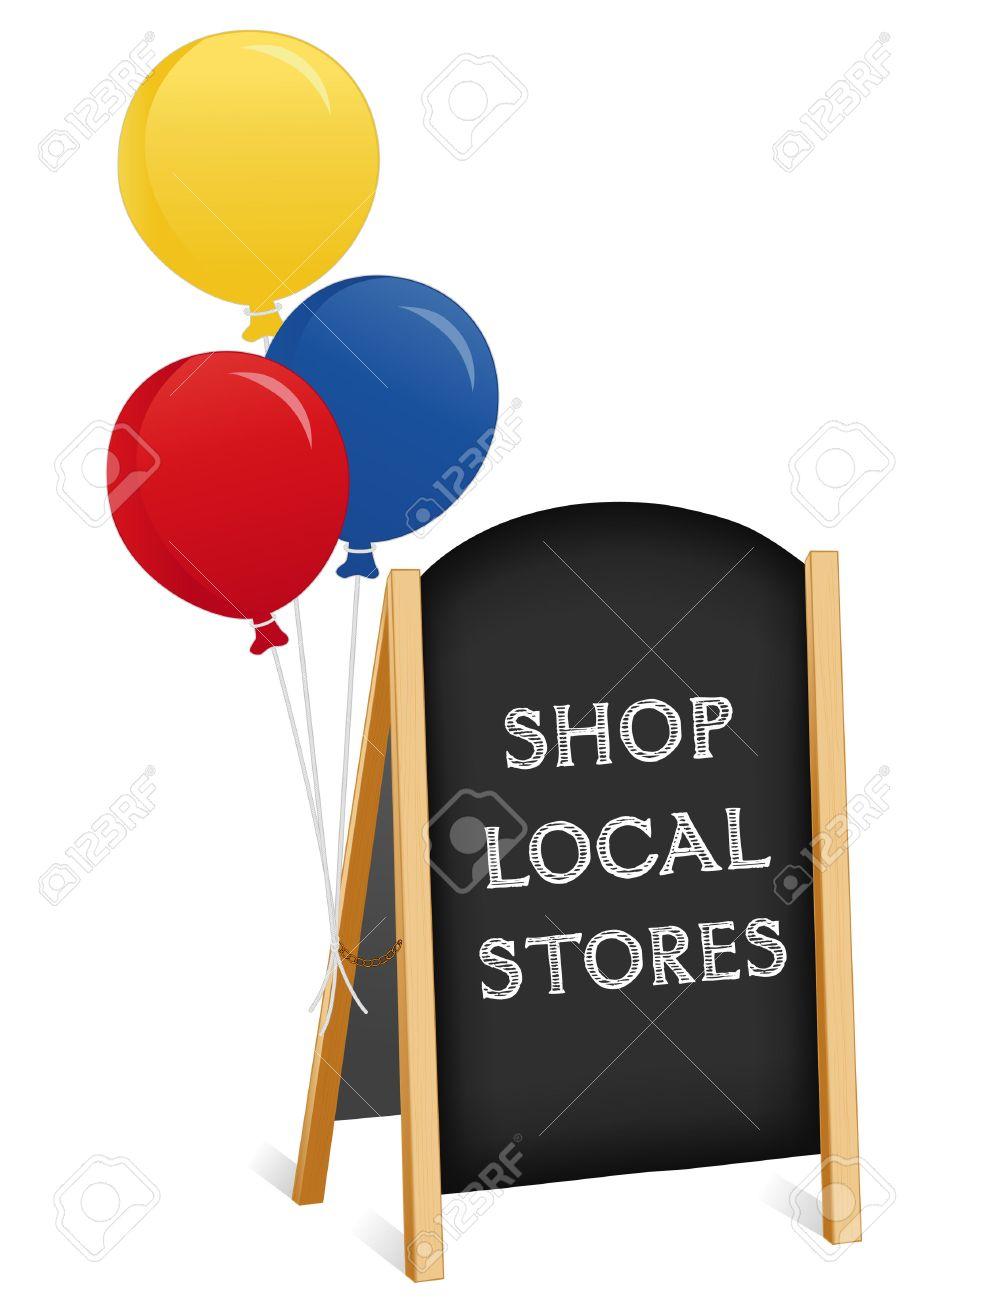 sign shop local stores chalk board balloons light wood frame folding sidewalk easel